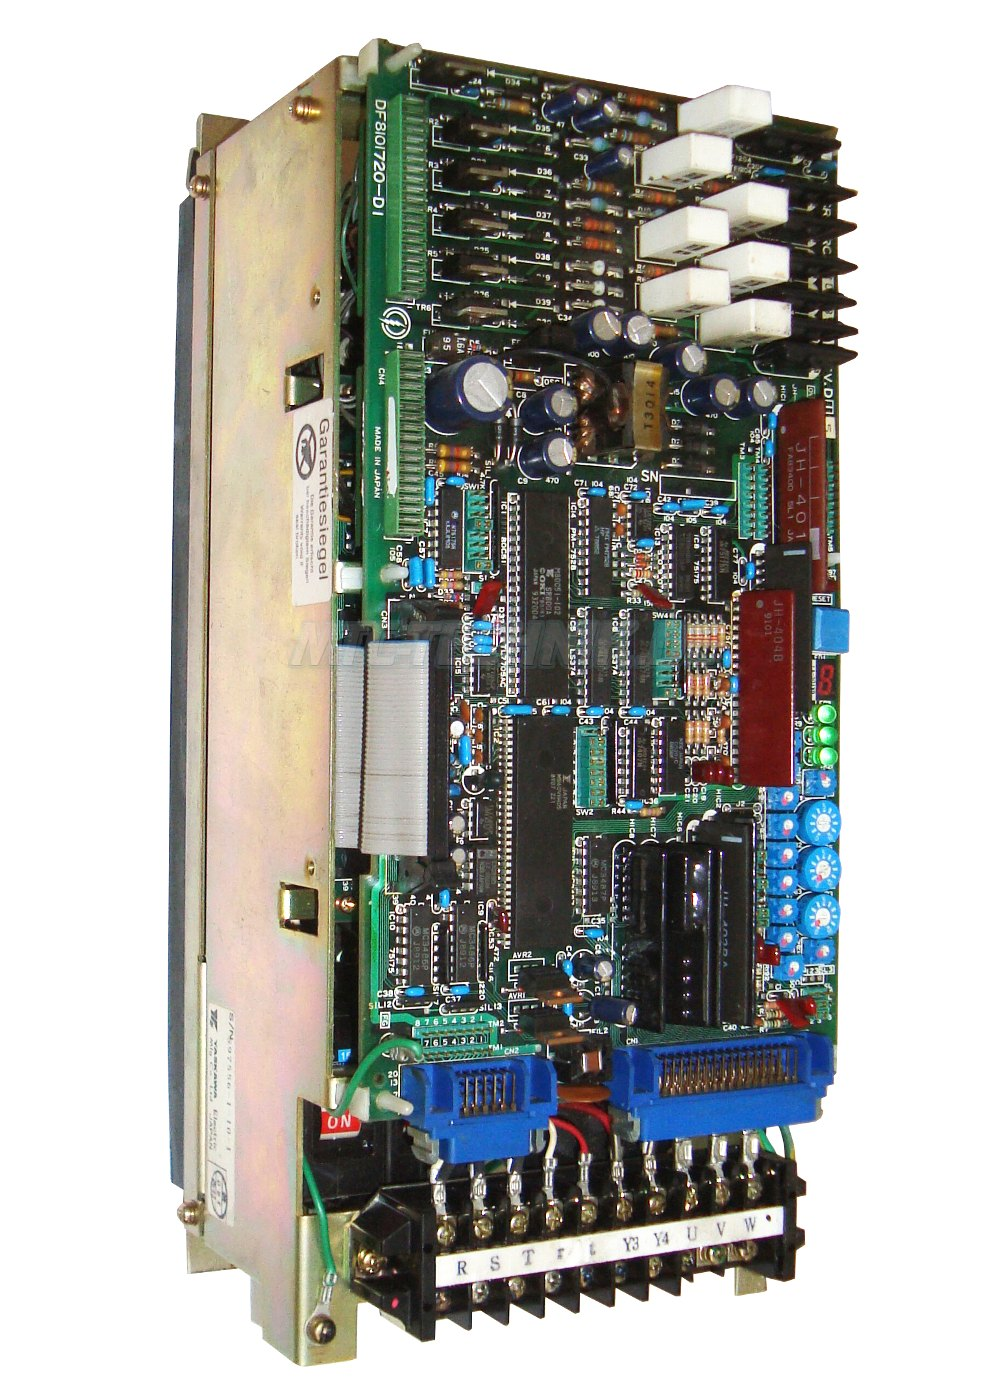 1 Yaskawa Cacr-sr20sb1bfy100 Frequenzumrichter Shop